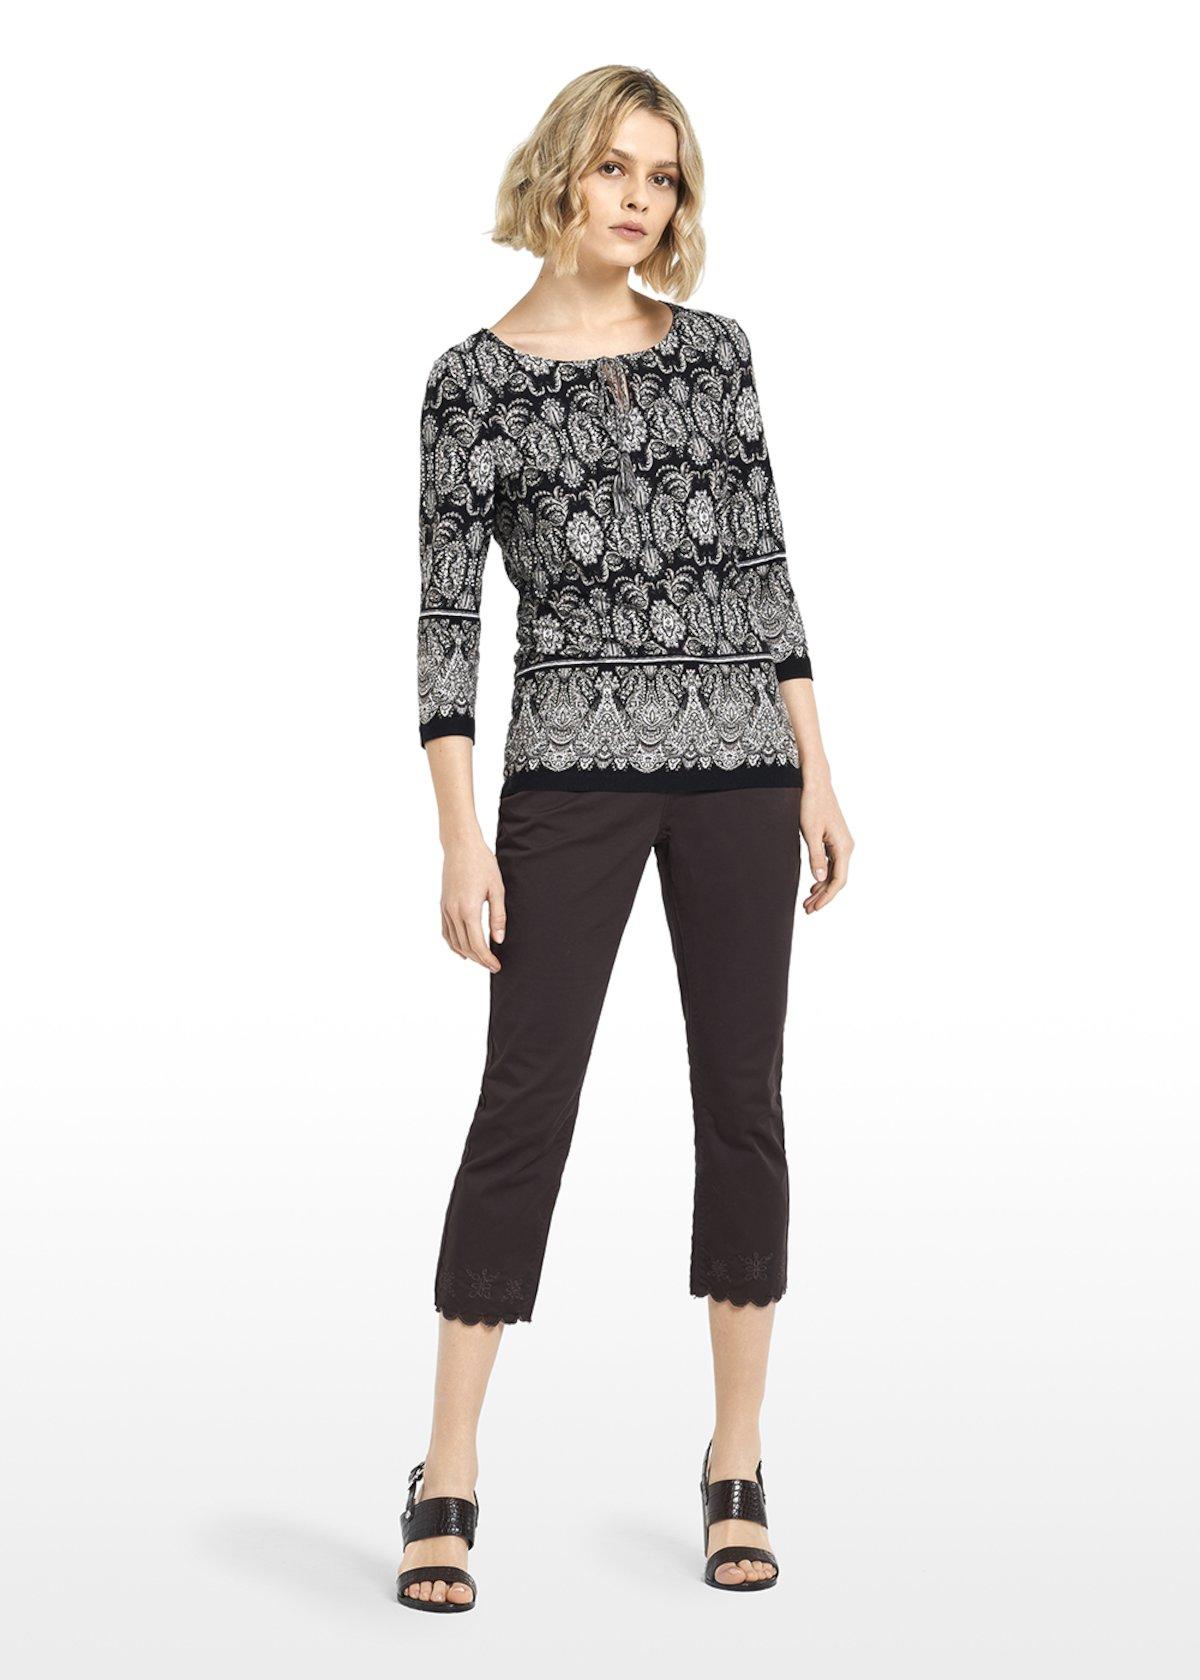 T-shirt Sadar in jersey fantasia cachemire con nappine - Black / White Fantasia - Donna